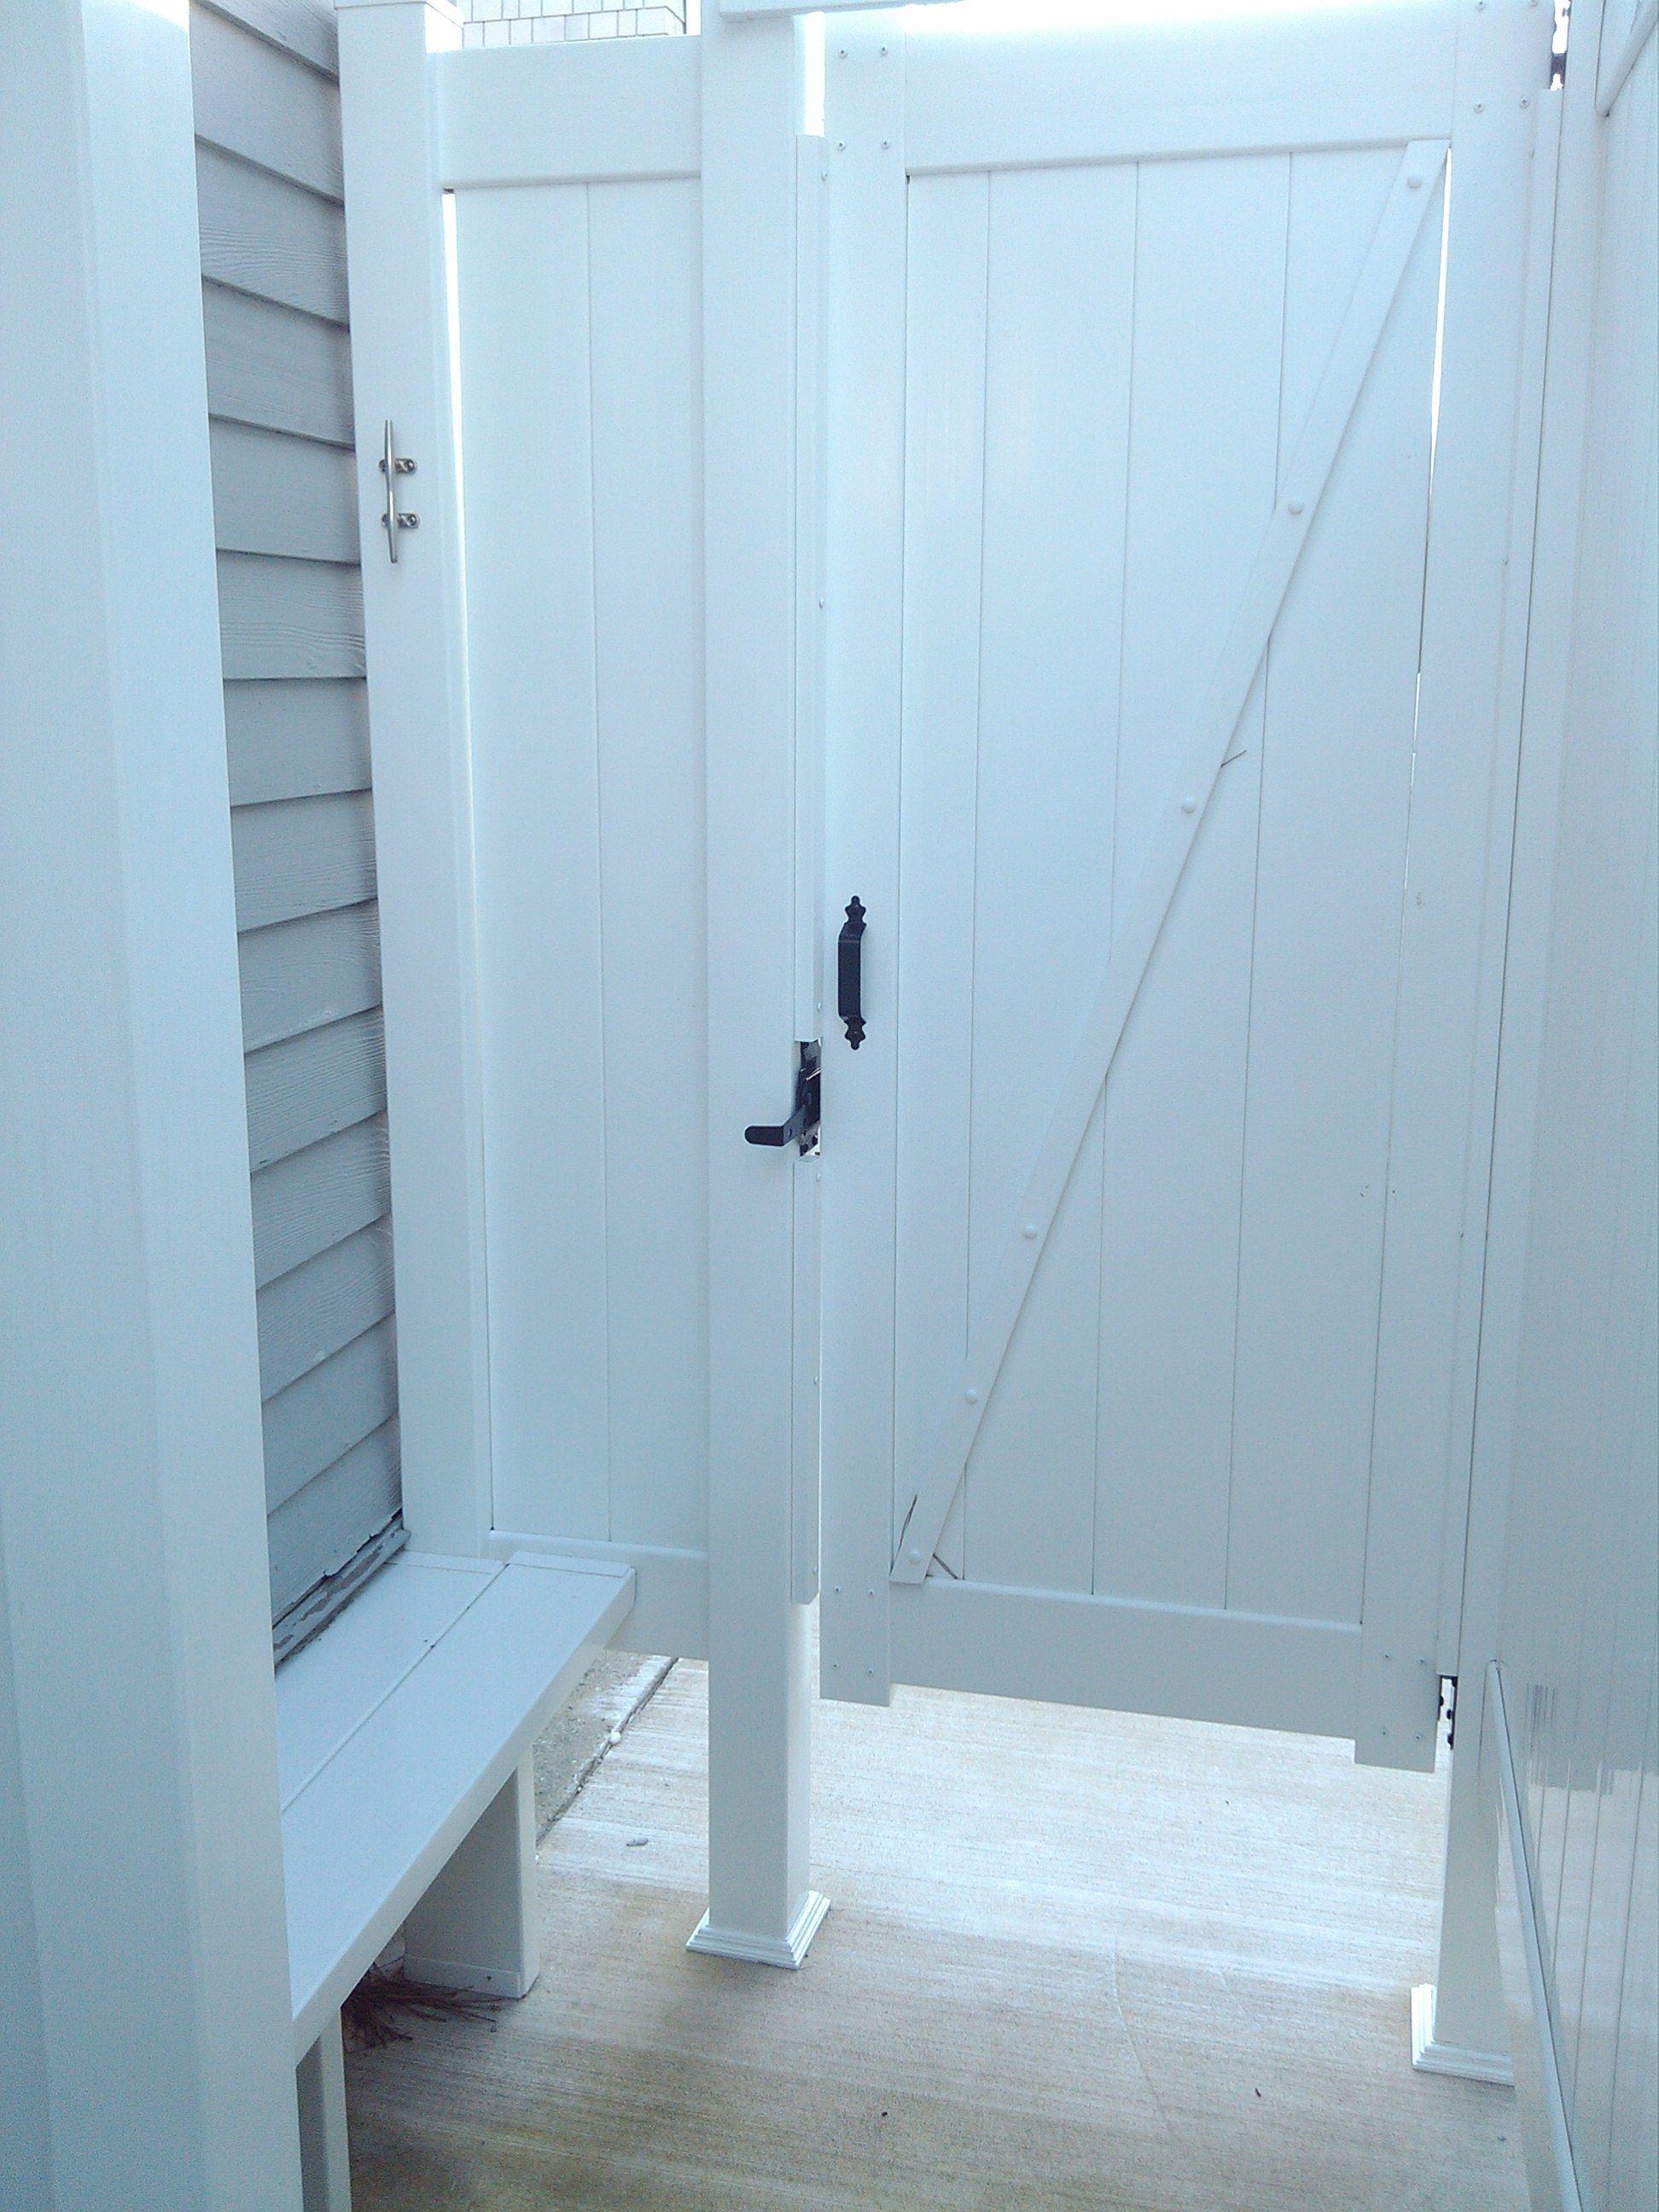 dennisvillefence.com outdoor-shower-enclosures-photo-gallery ...